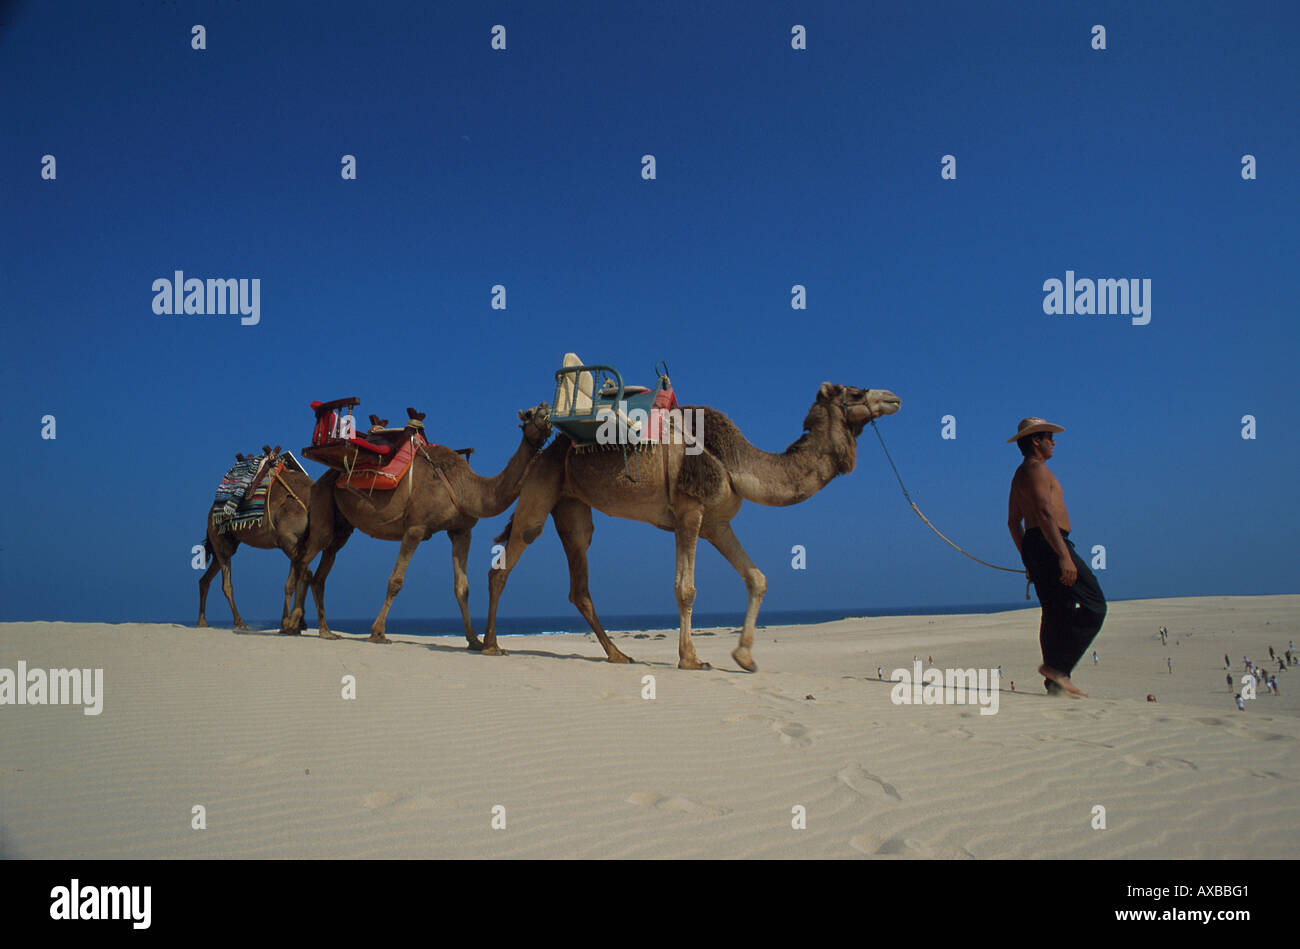 Kamelritt in den Duenen, Corralejo, Fuerteventura Kanarische Inseln, Spanien - Stock Image